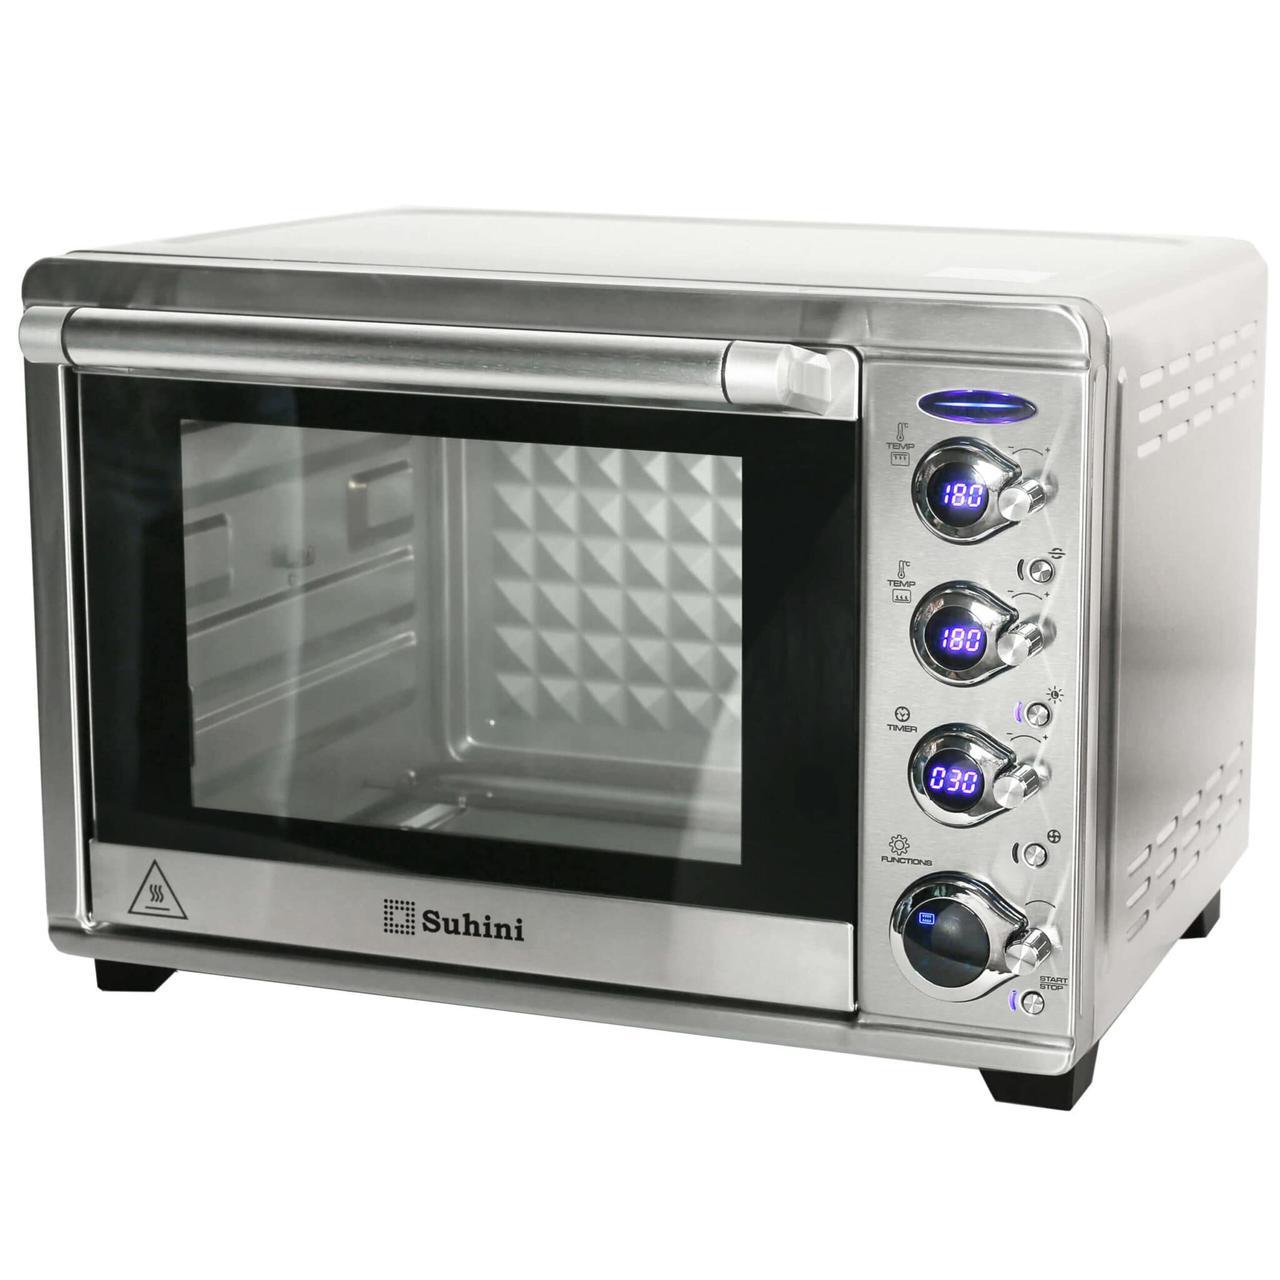 Конвекционная печь для дома Suhini SH-OR-1538LUX